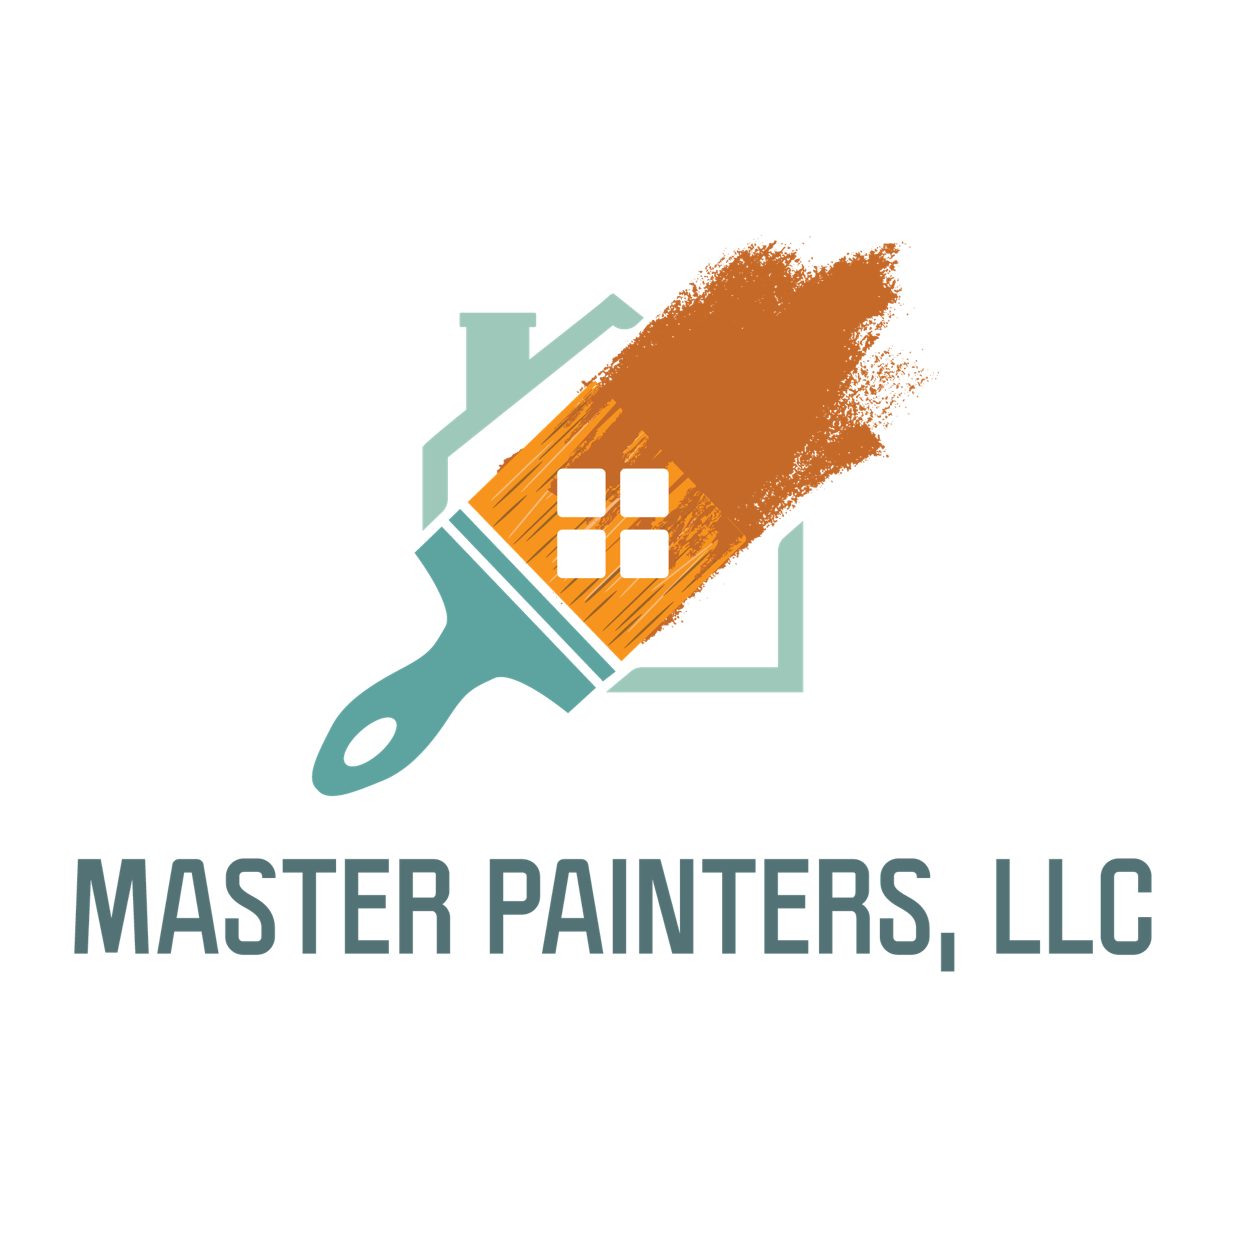 Master Painters, LLC